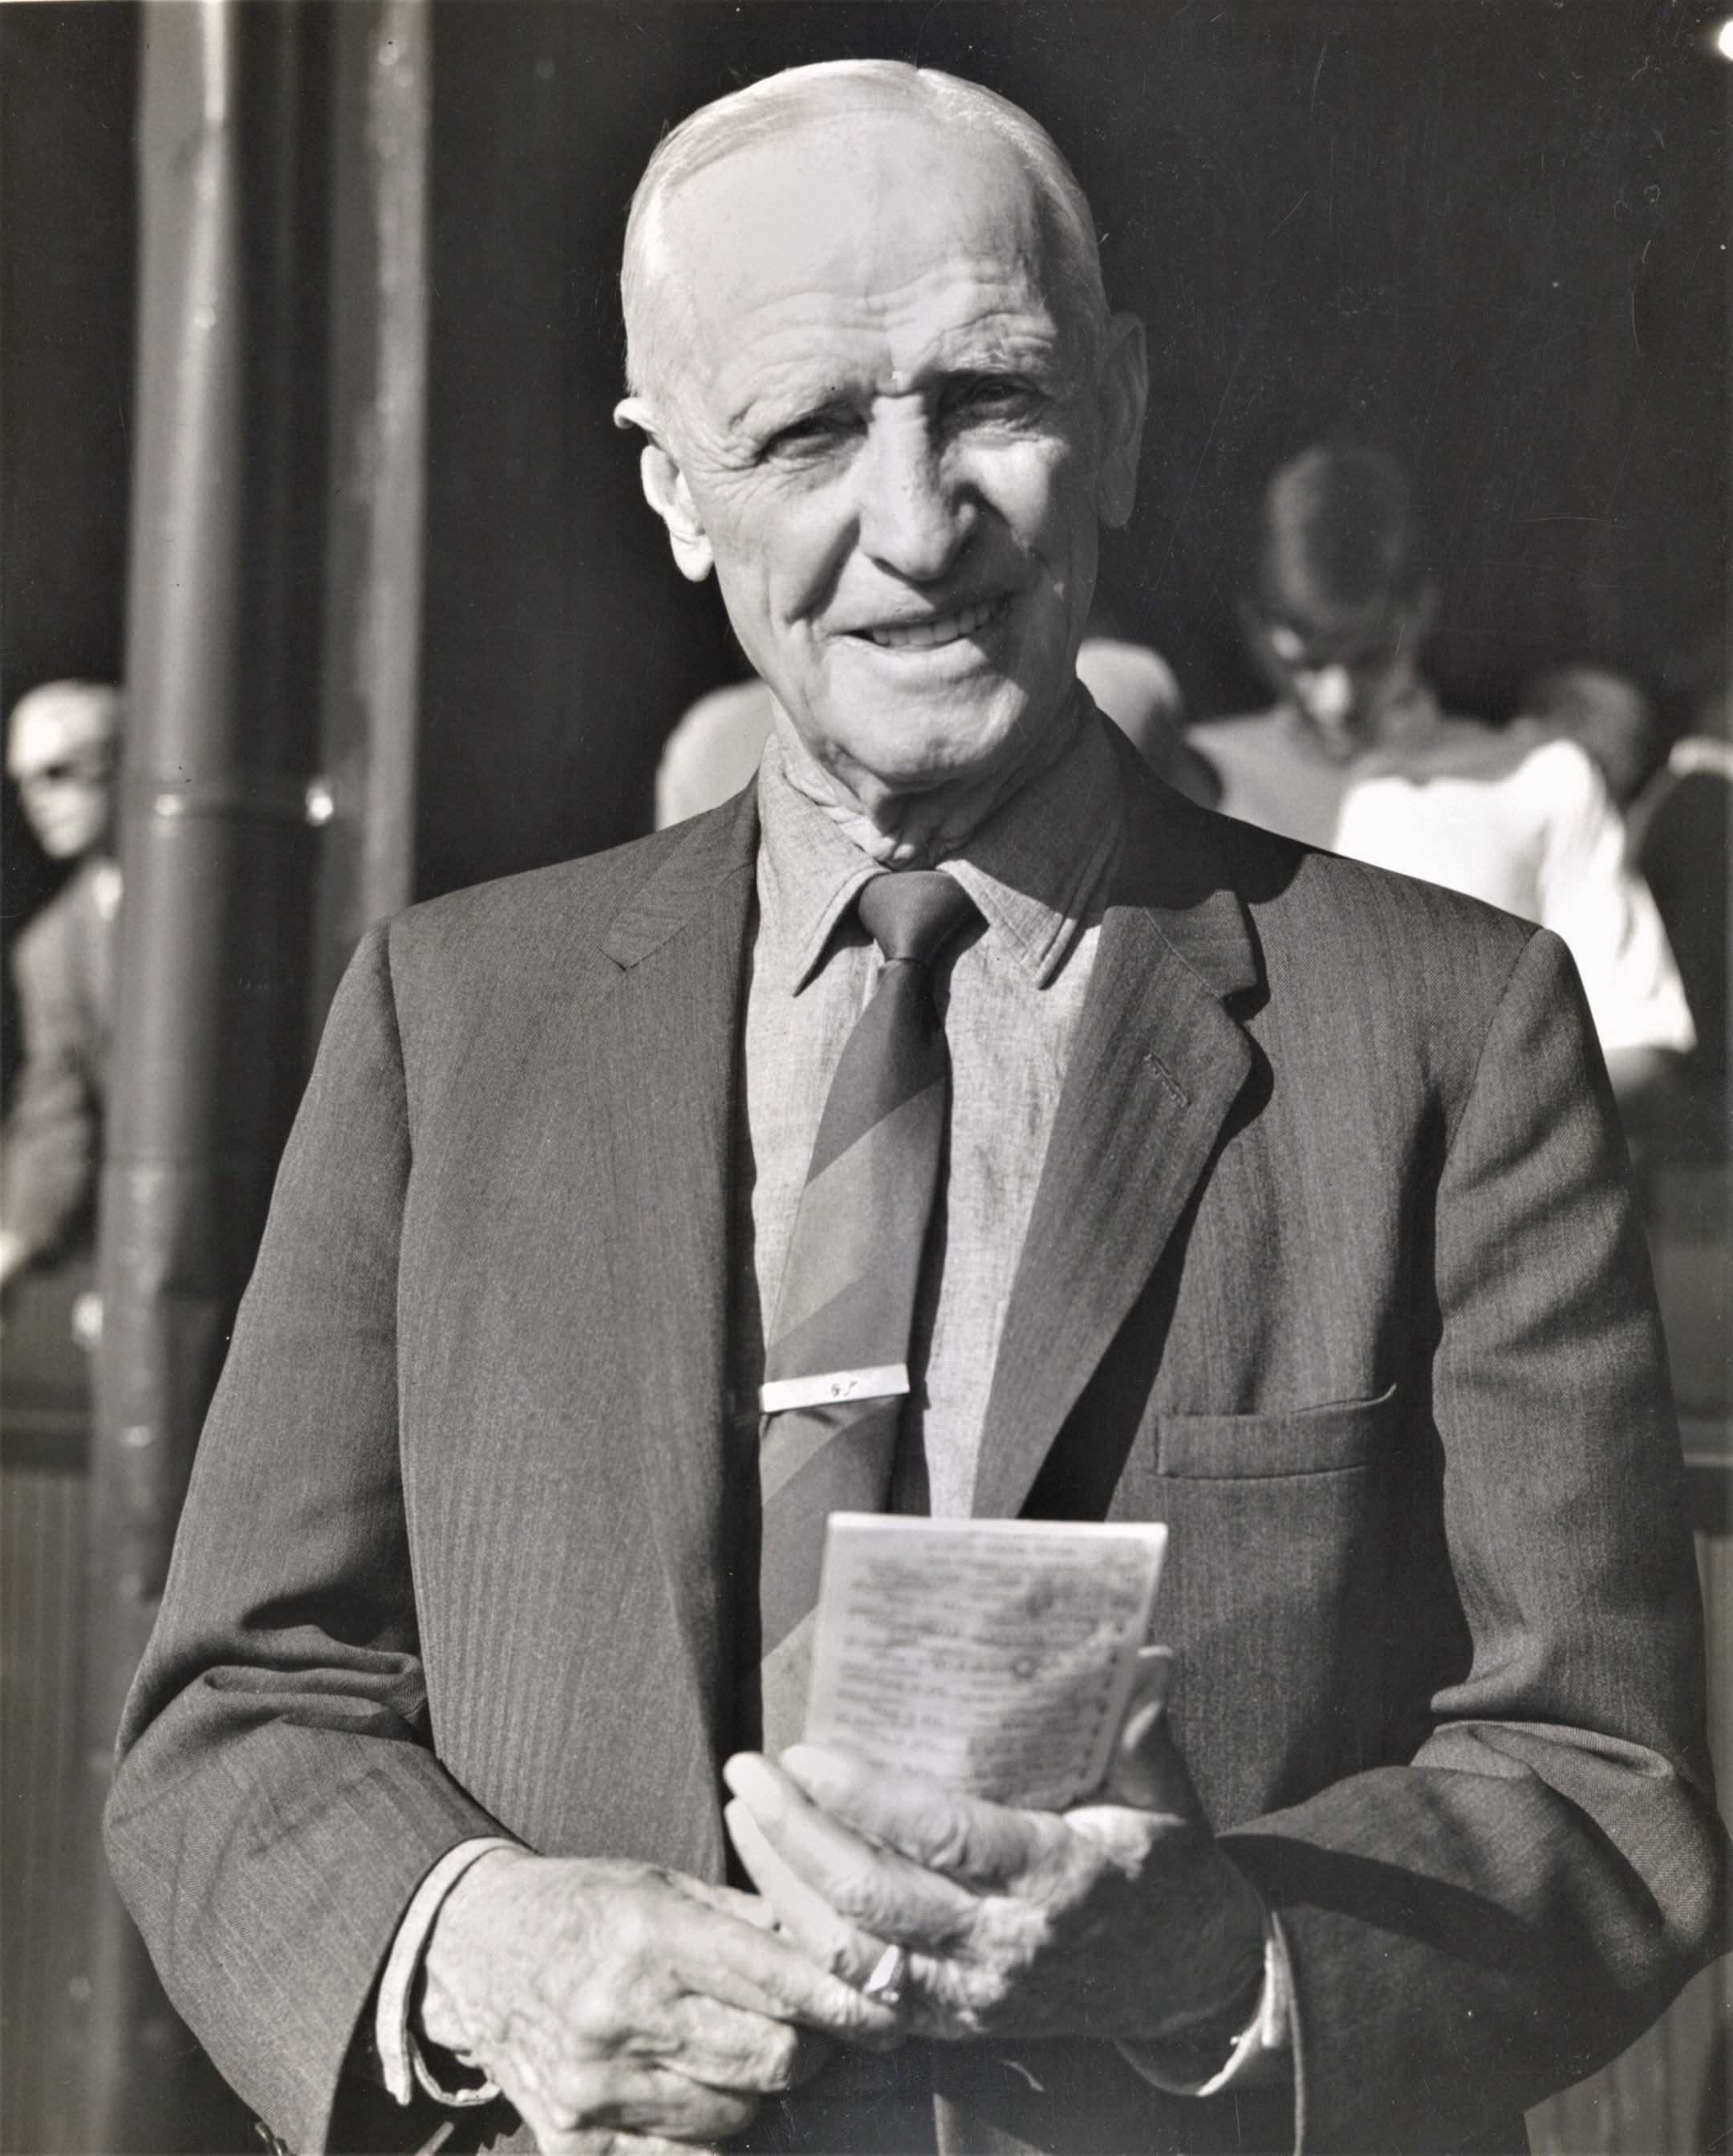 Frank E. Childs in 1966 (Keeneland Association)